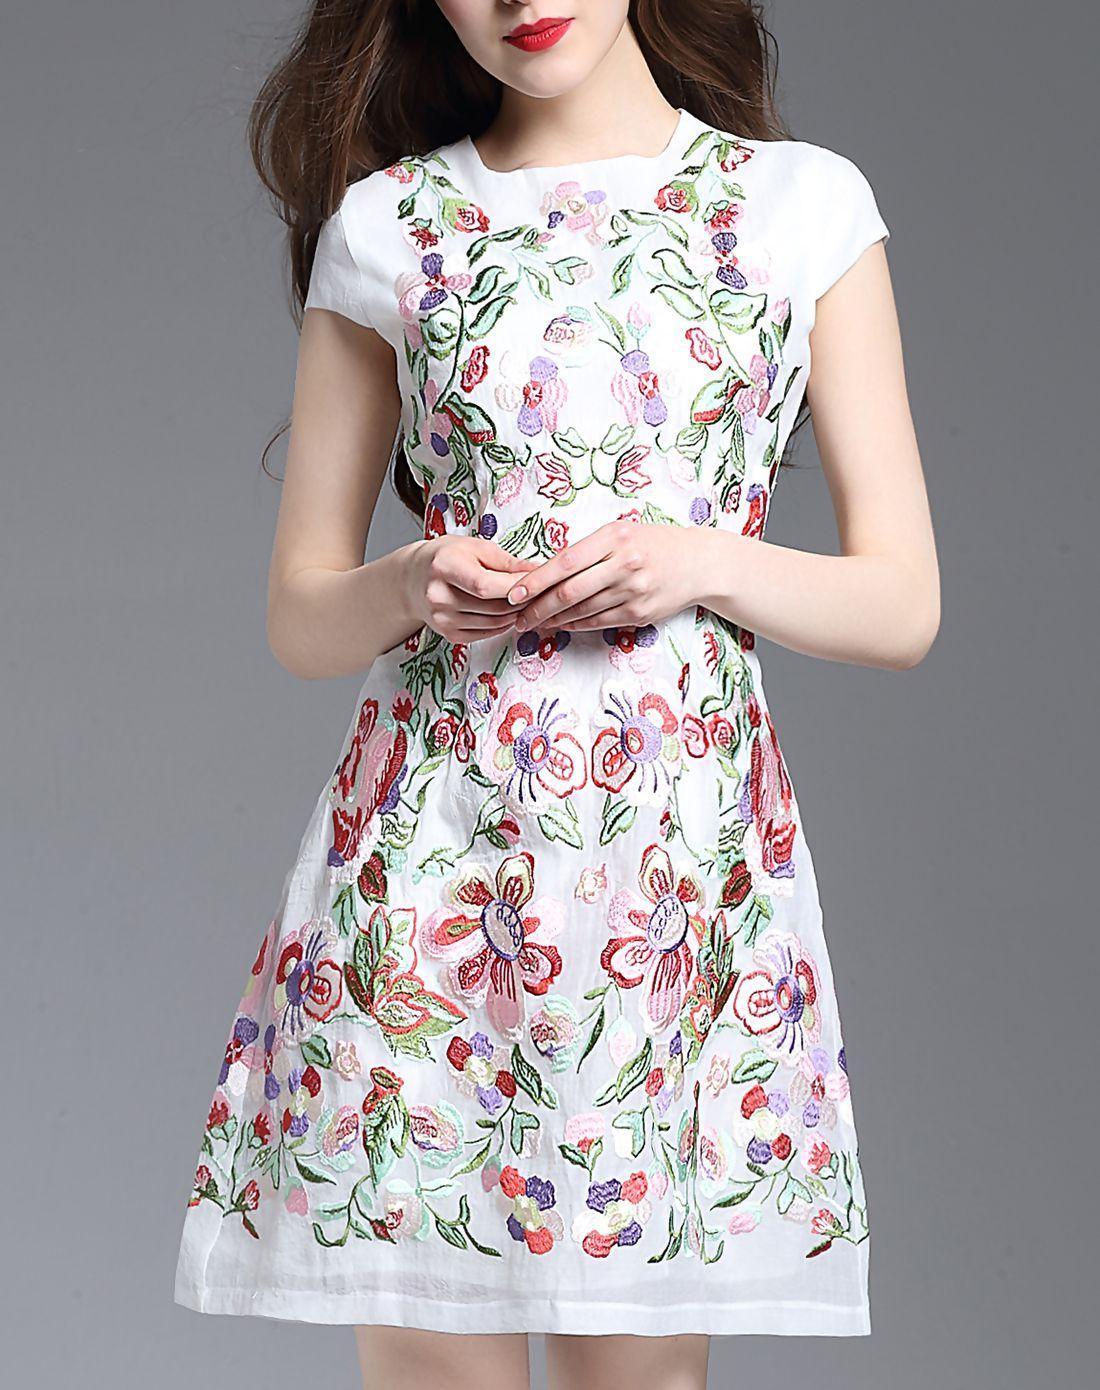 Adorewe vipme sheath dressesdesigner yujia white seersucker cap